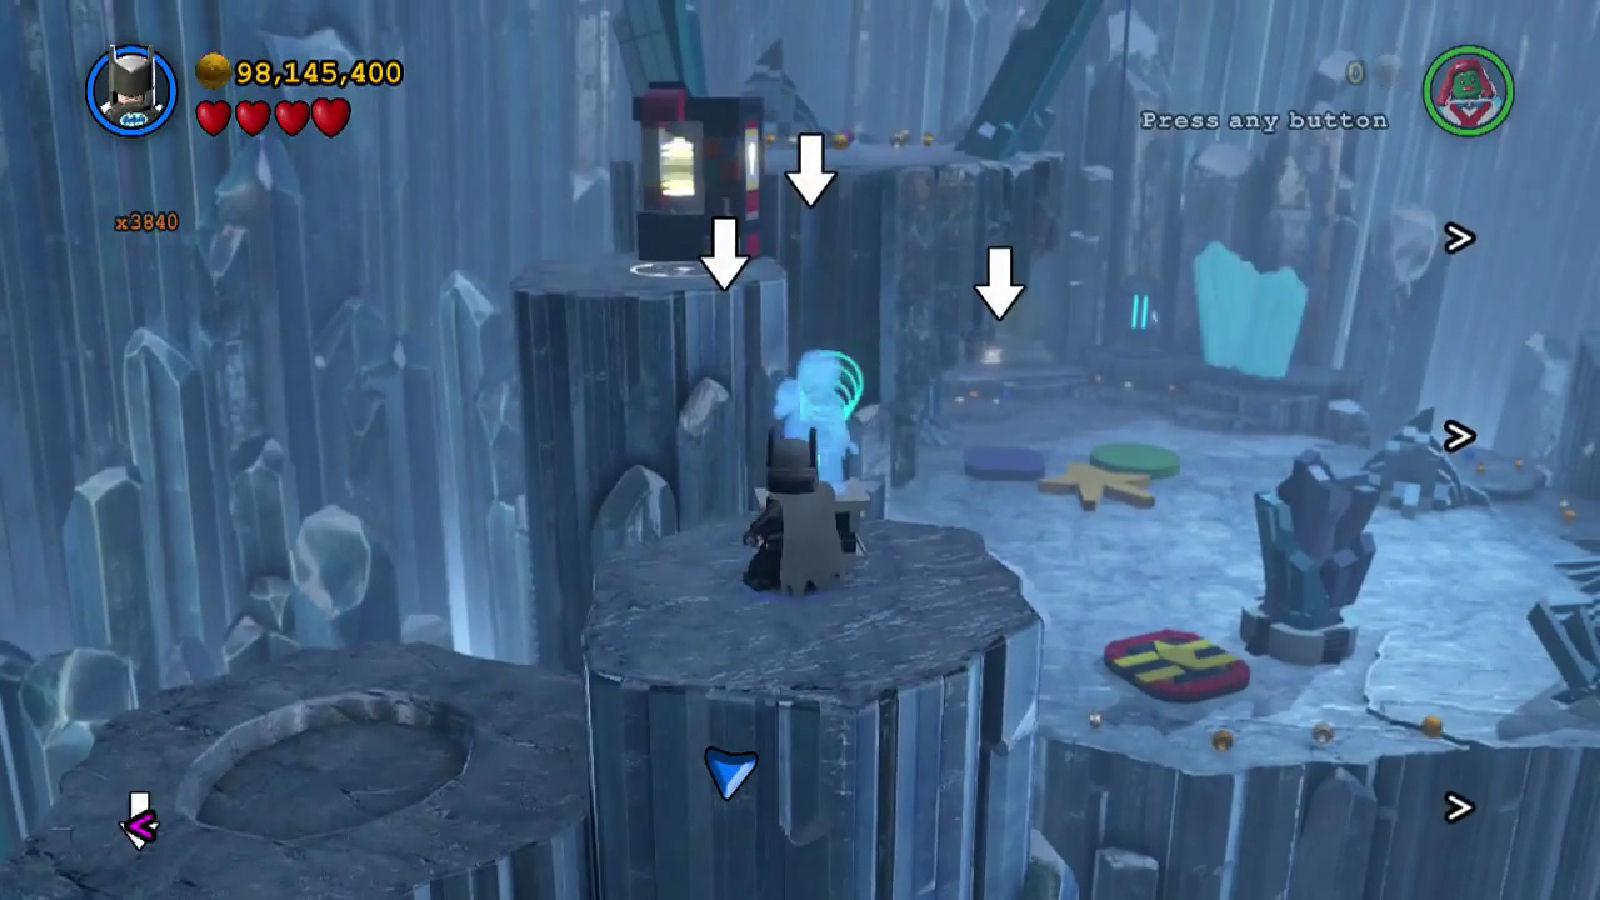 LEGO Batman 3: Beyond Gotham Red Brick Guide